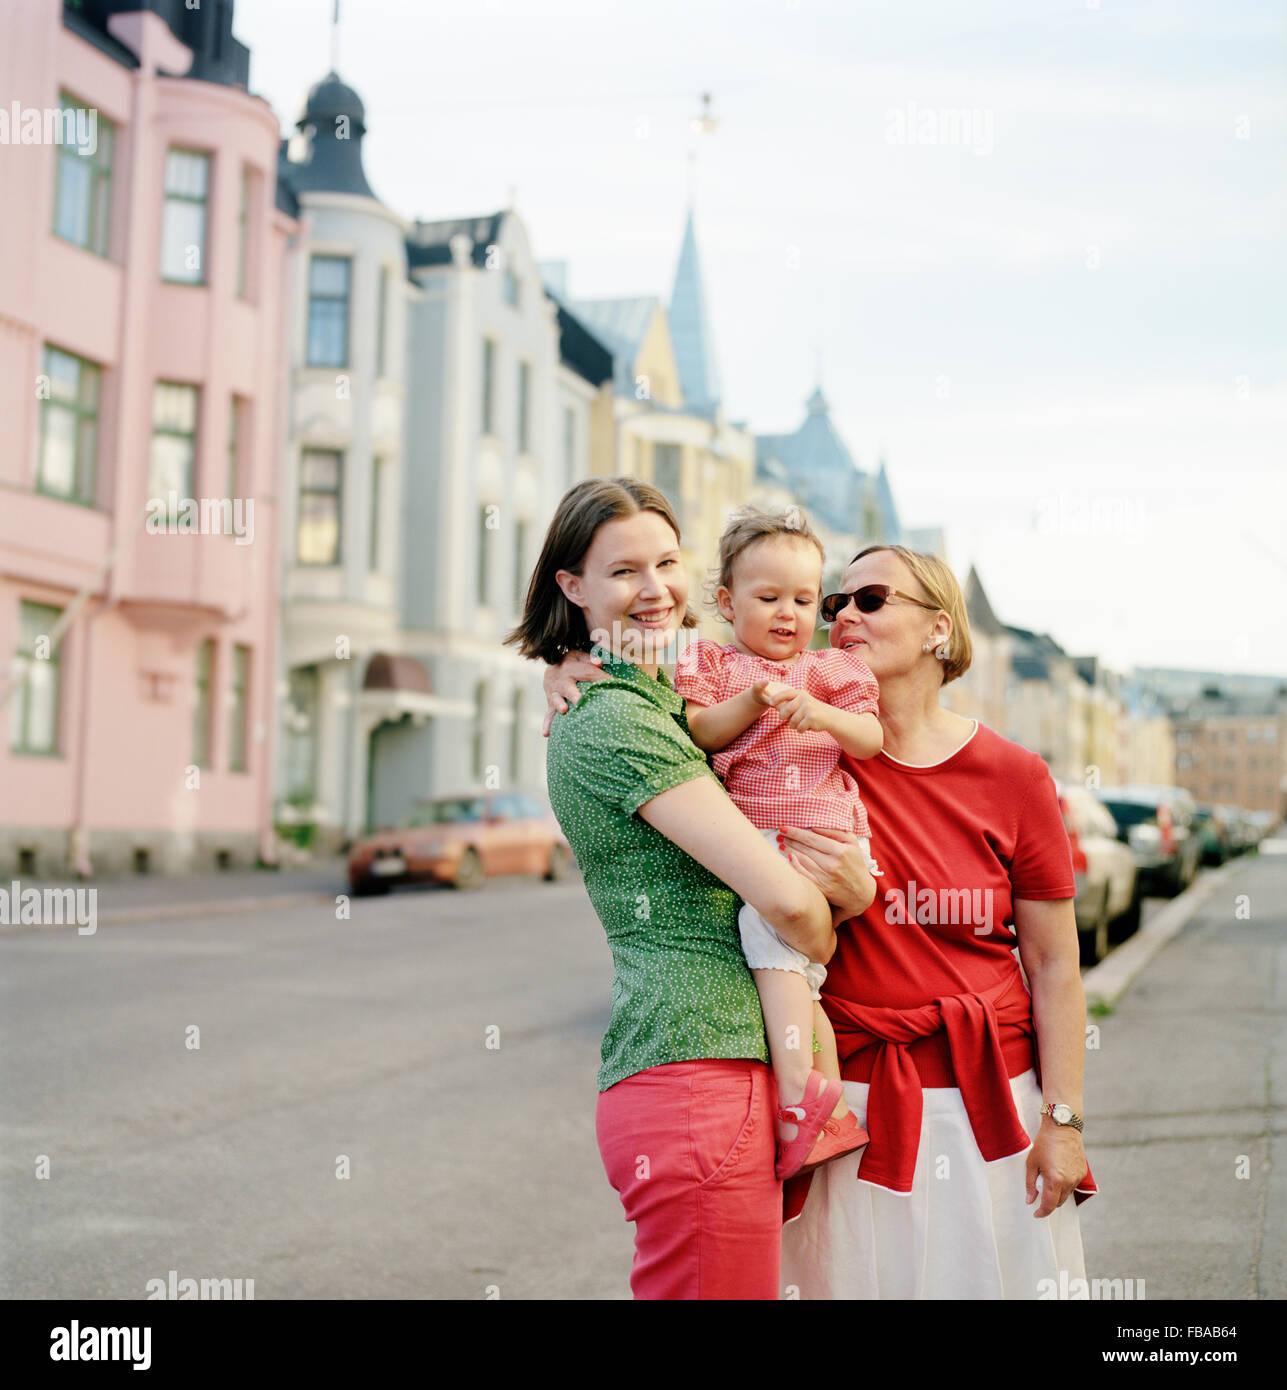 Finland, Uusimaa, Helsinki, Portrait of mother, grandmother and child (2-3) on street - Stock Image